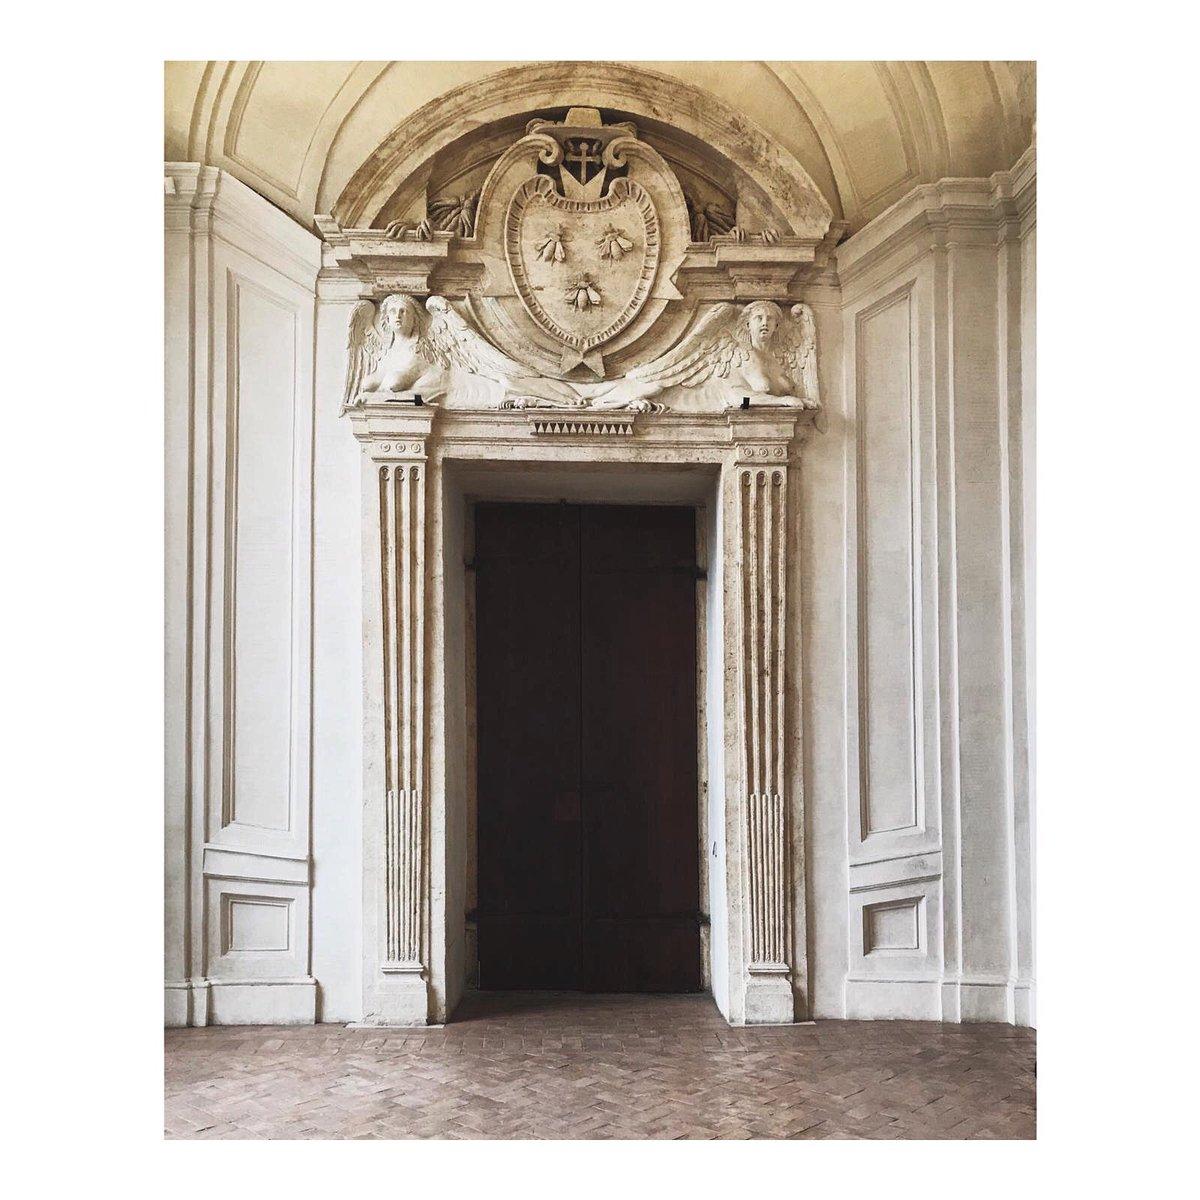 Roma  #palazzobarberini #arte #art #Roma #Rome #architecture #arquitectura pic.twitter.com/bT6kBK0wFY